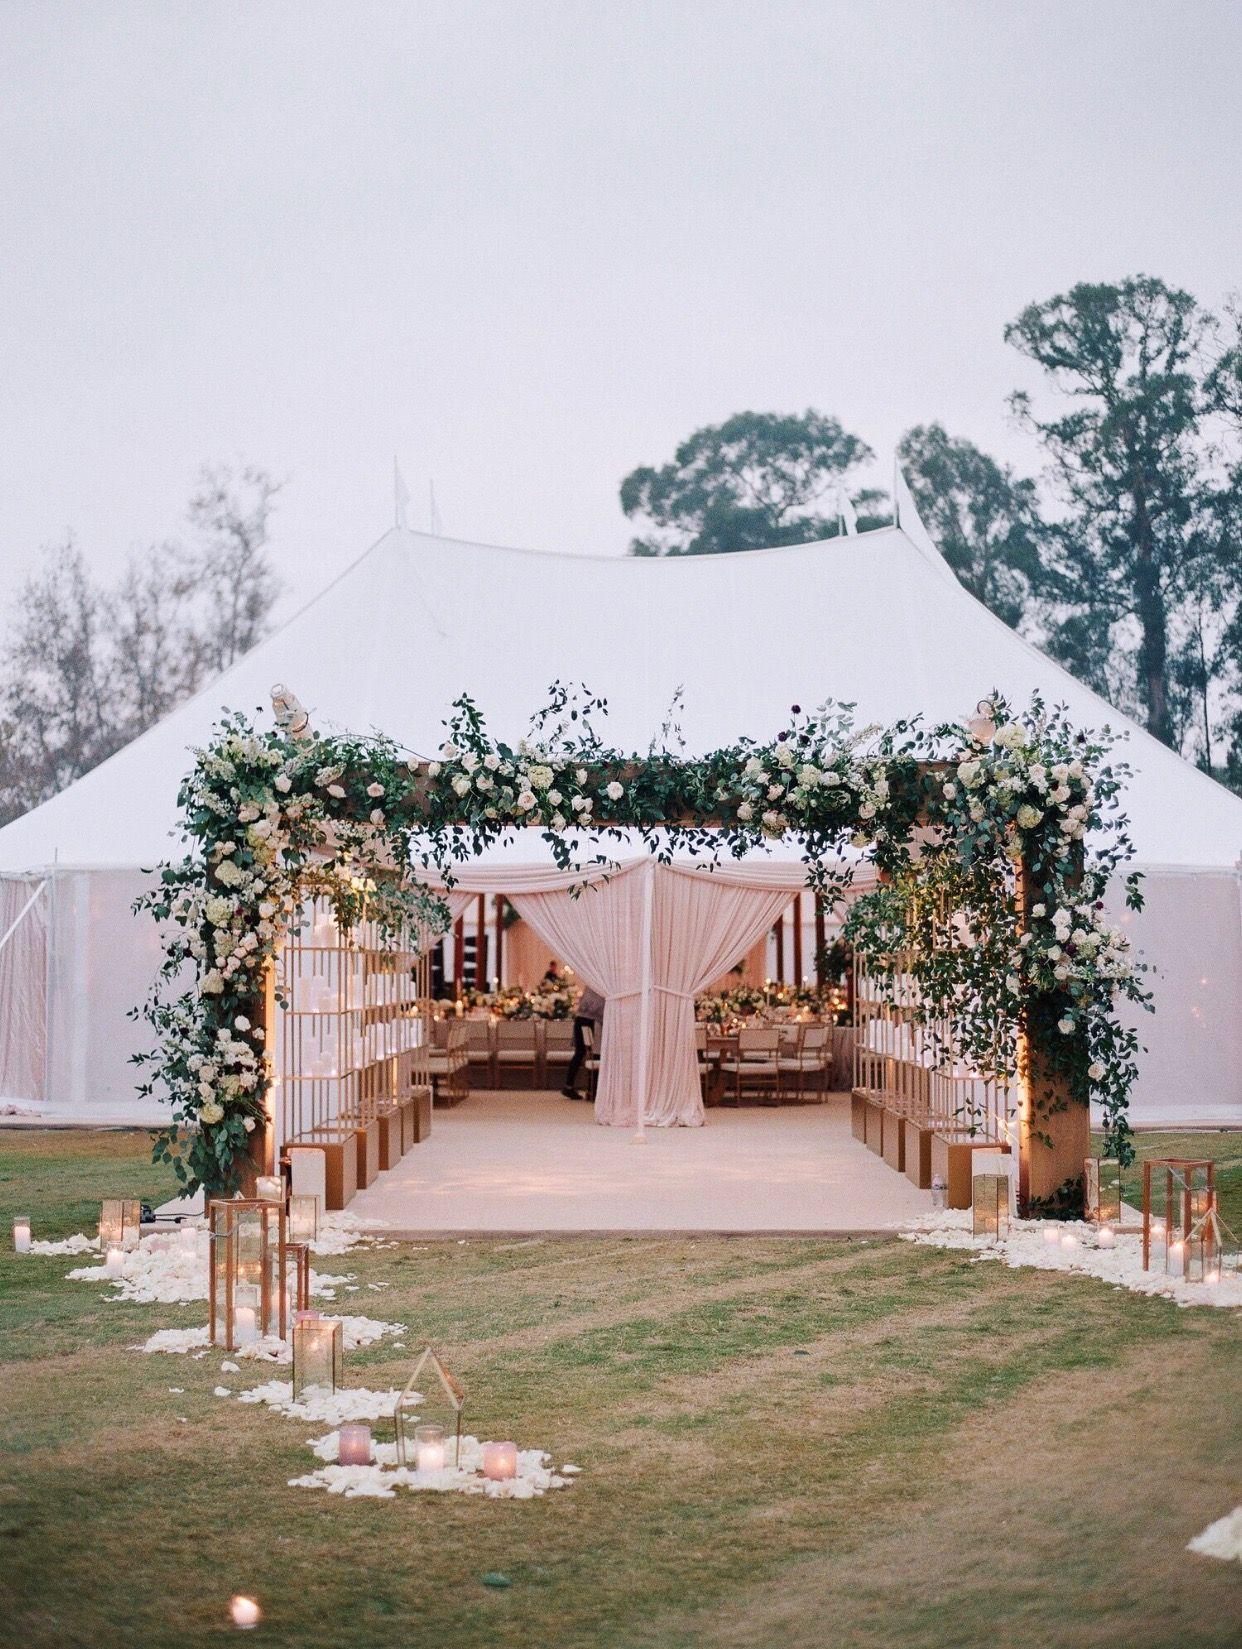 Home Wedding Event Design Tent Wedding Marquee Wedding